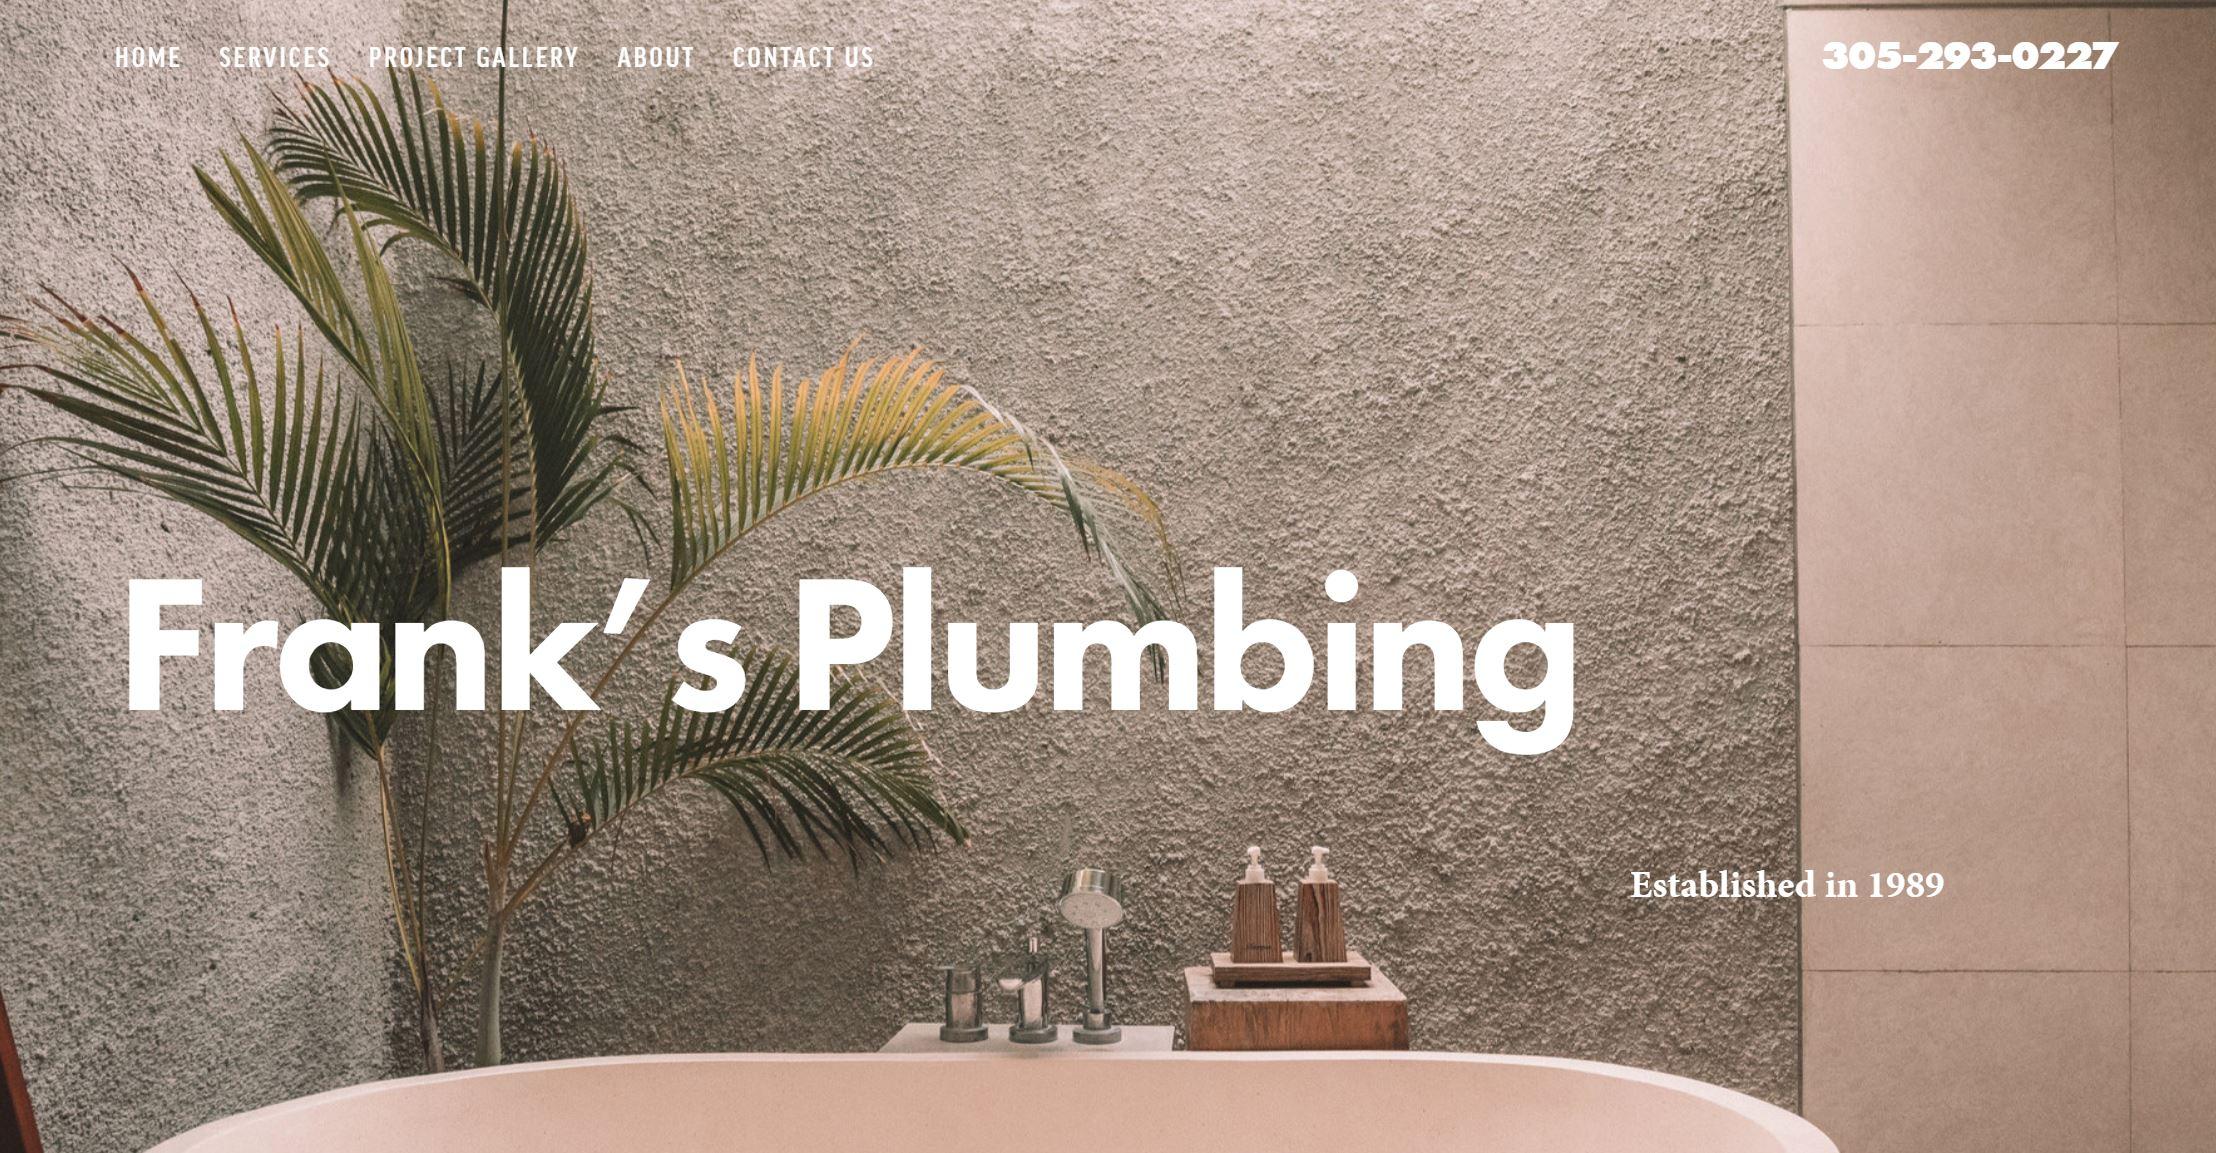 Franks Plumbing